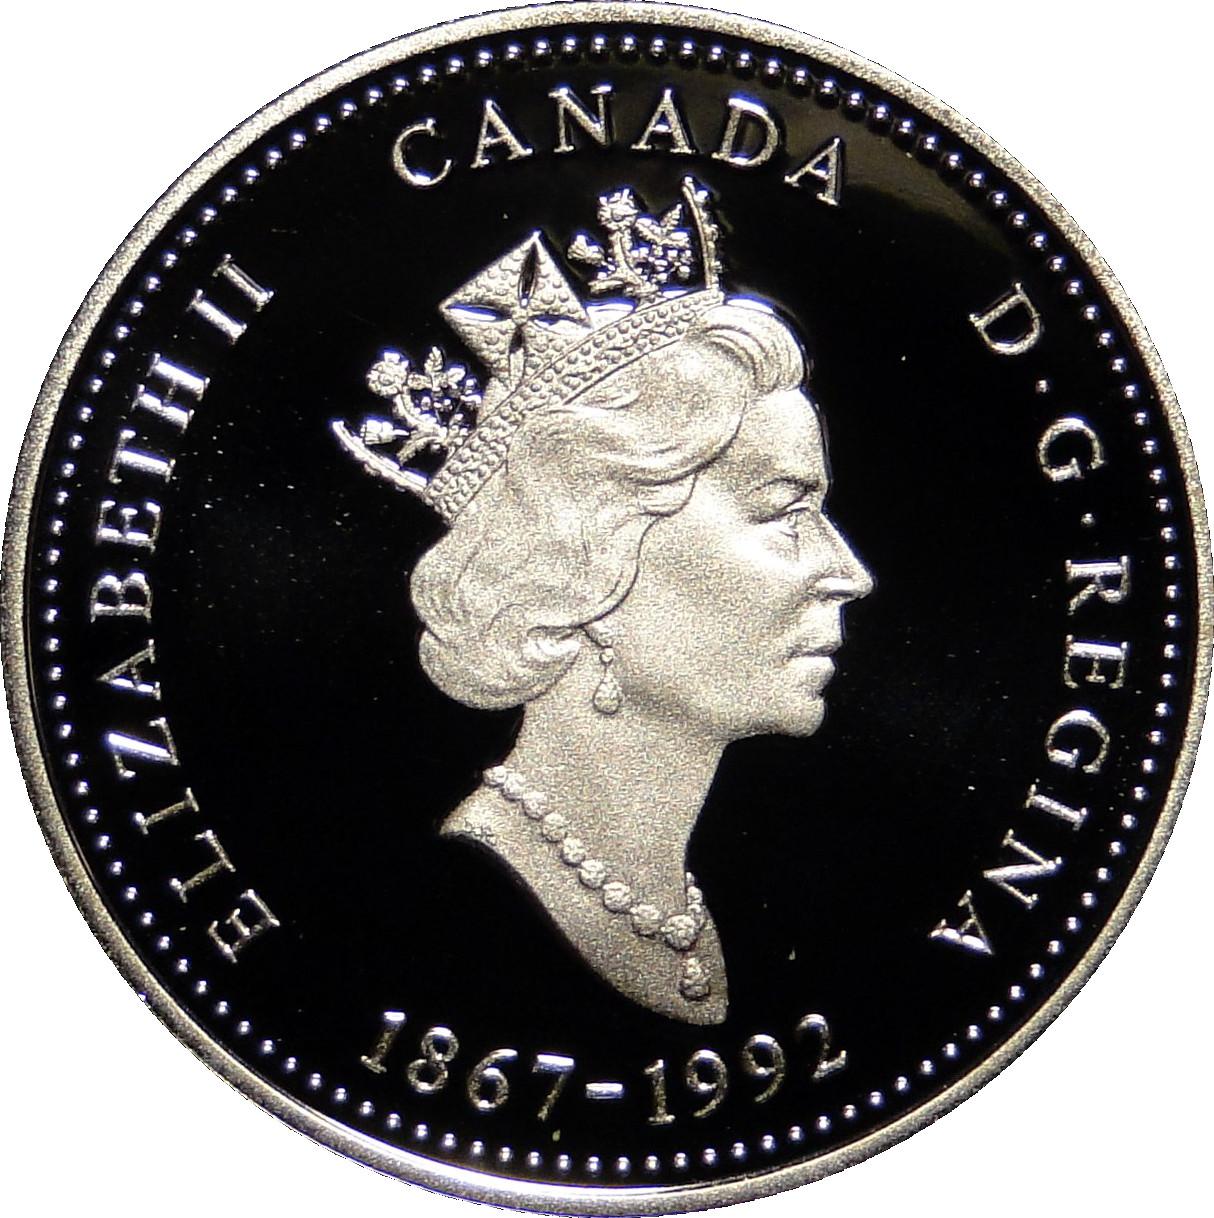 CANADA 1867-1992 ANNIVERSARY 25¢ ONTARIO SILVER PROOF QUARTER COIN